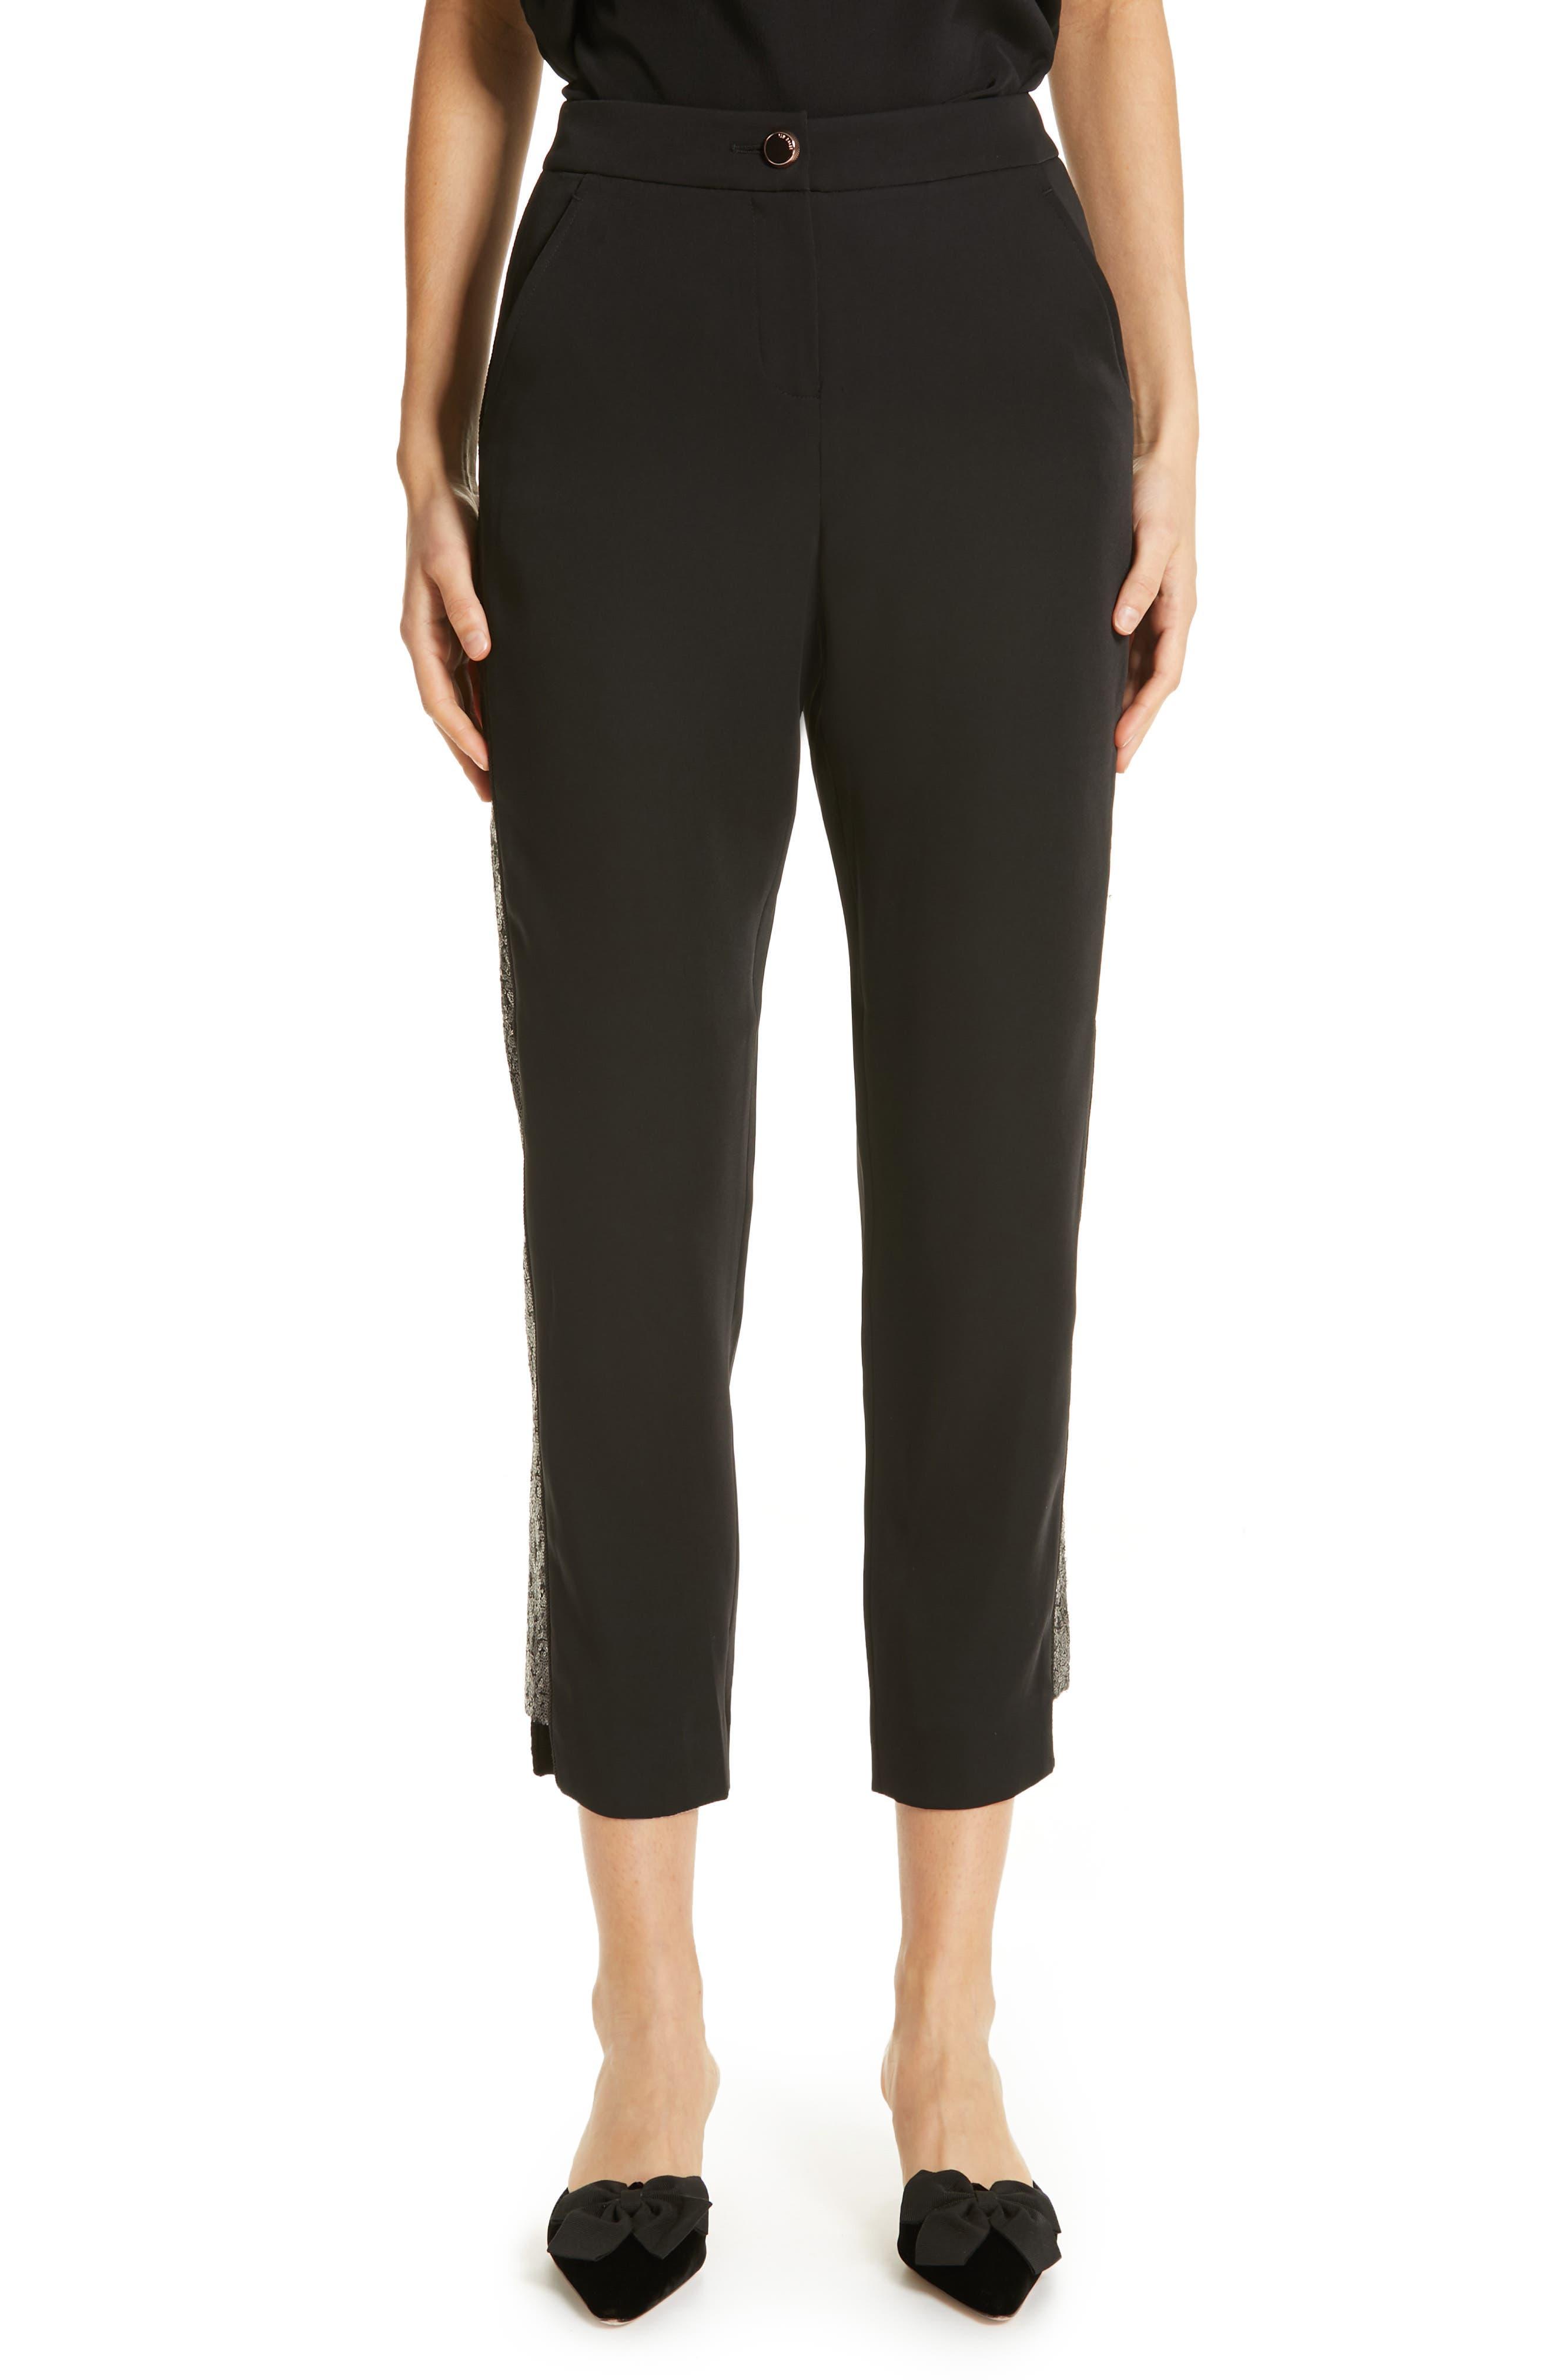 Polliit Sequin Side Panel Pants in Black